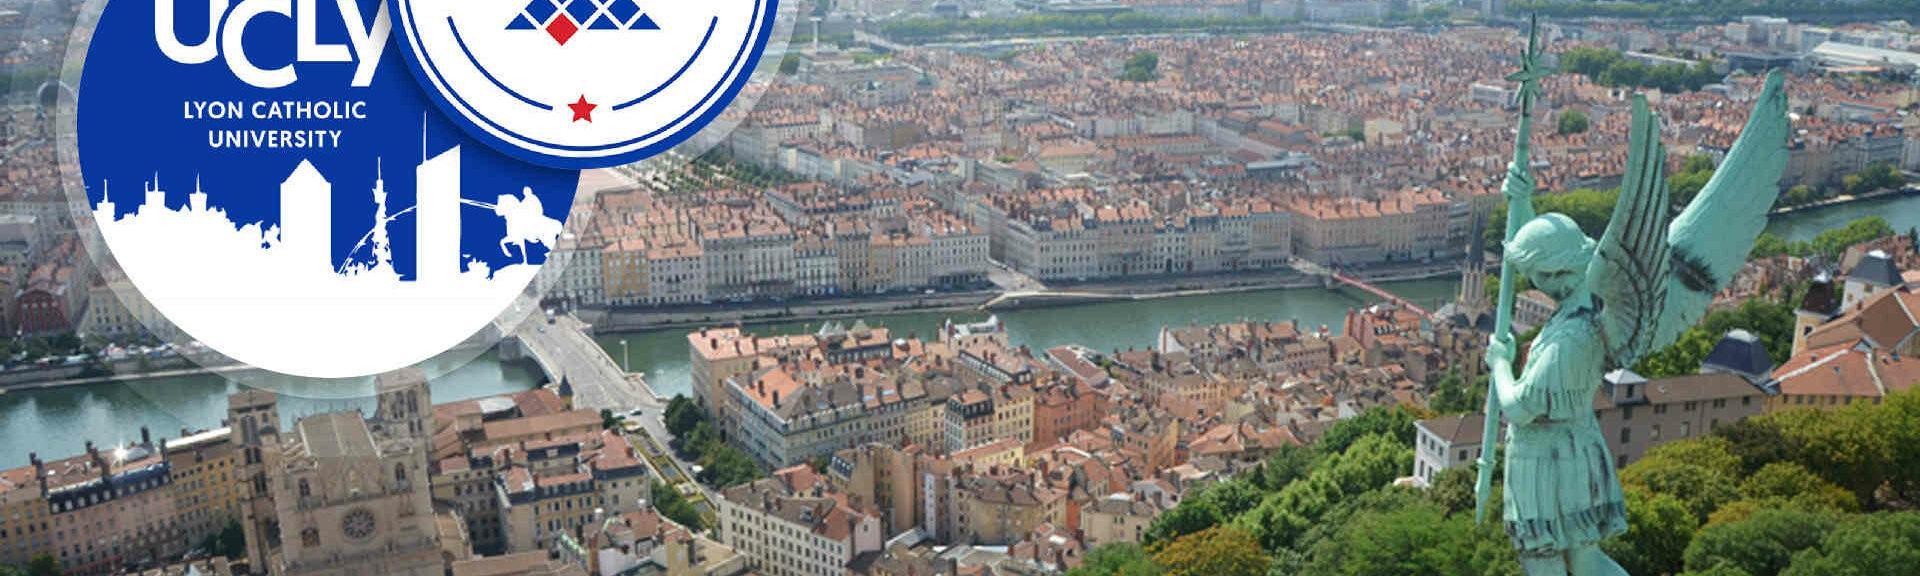 Panorama Lyon UCLy